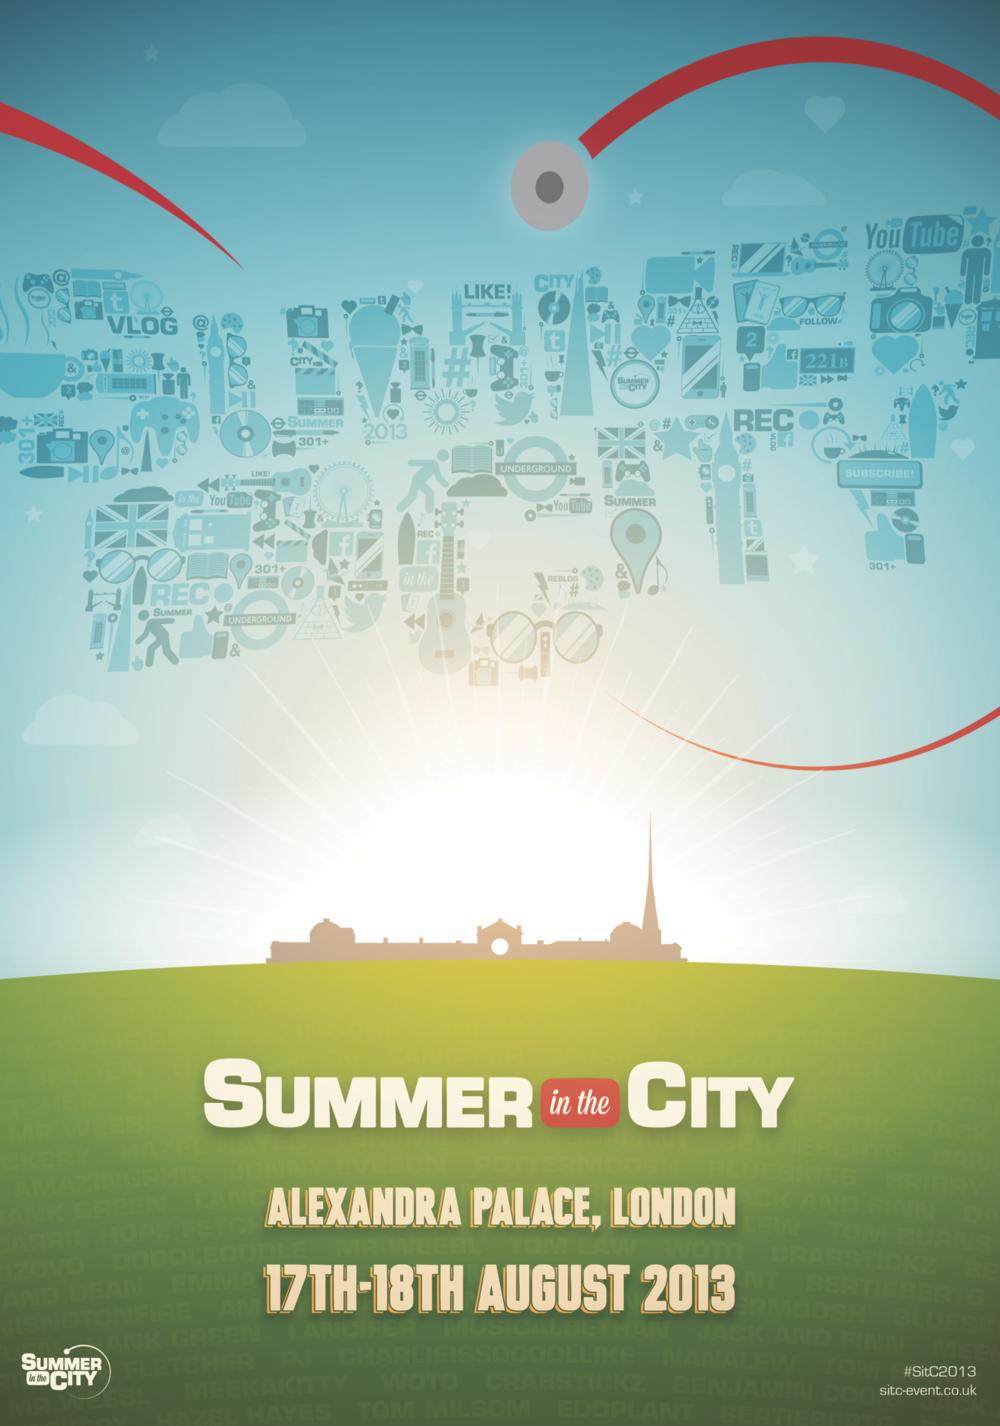 2013 poster design